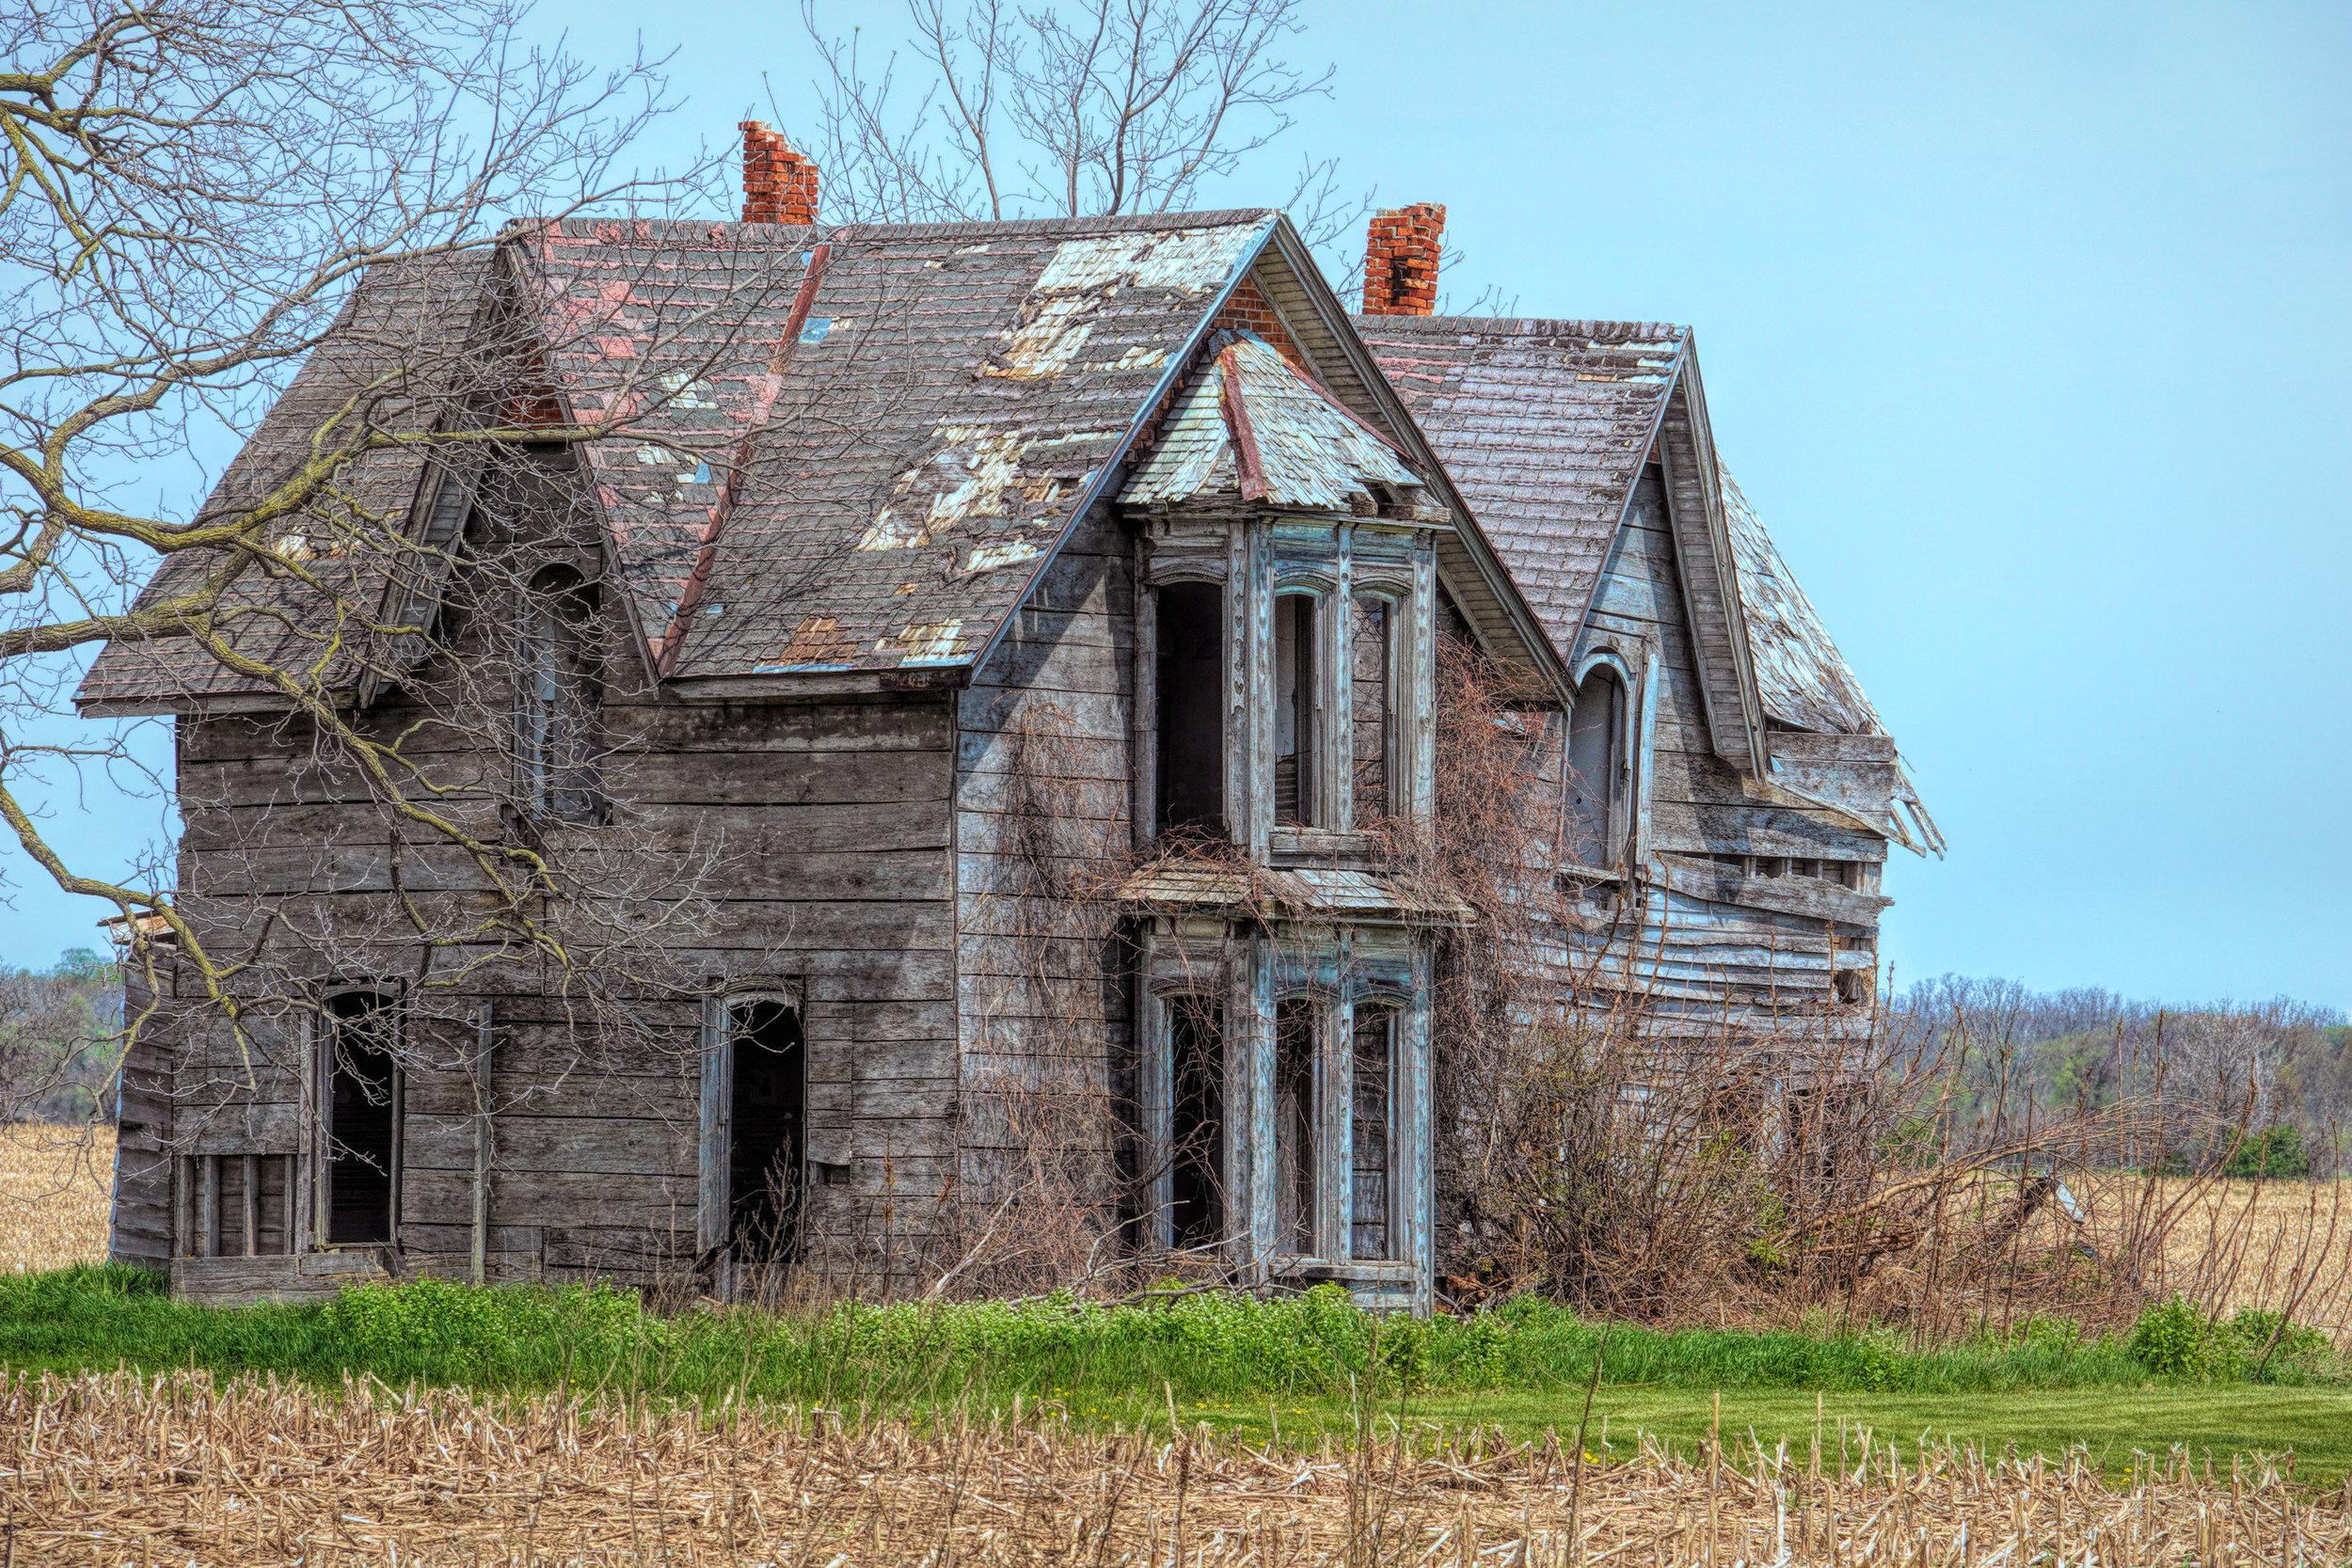 old delapidated house 1.jpg